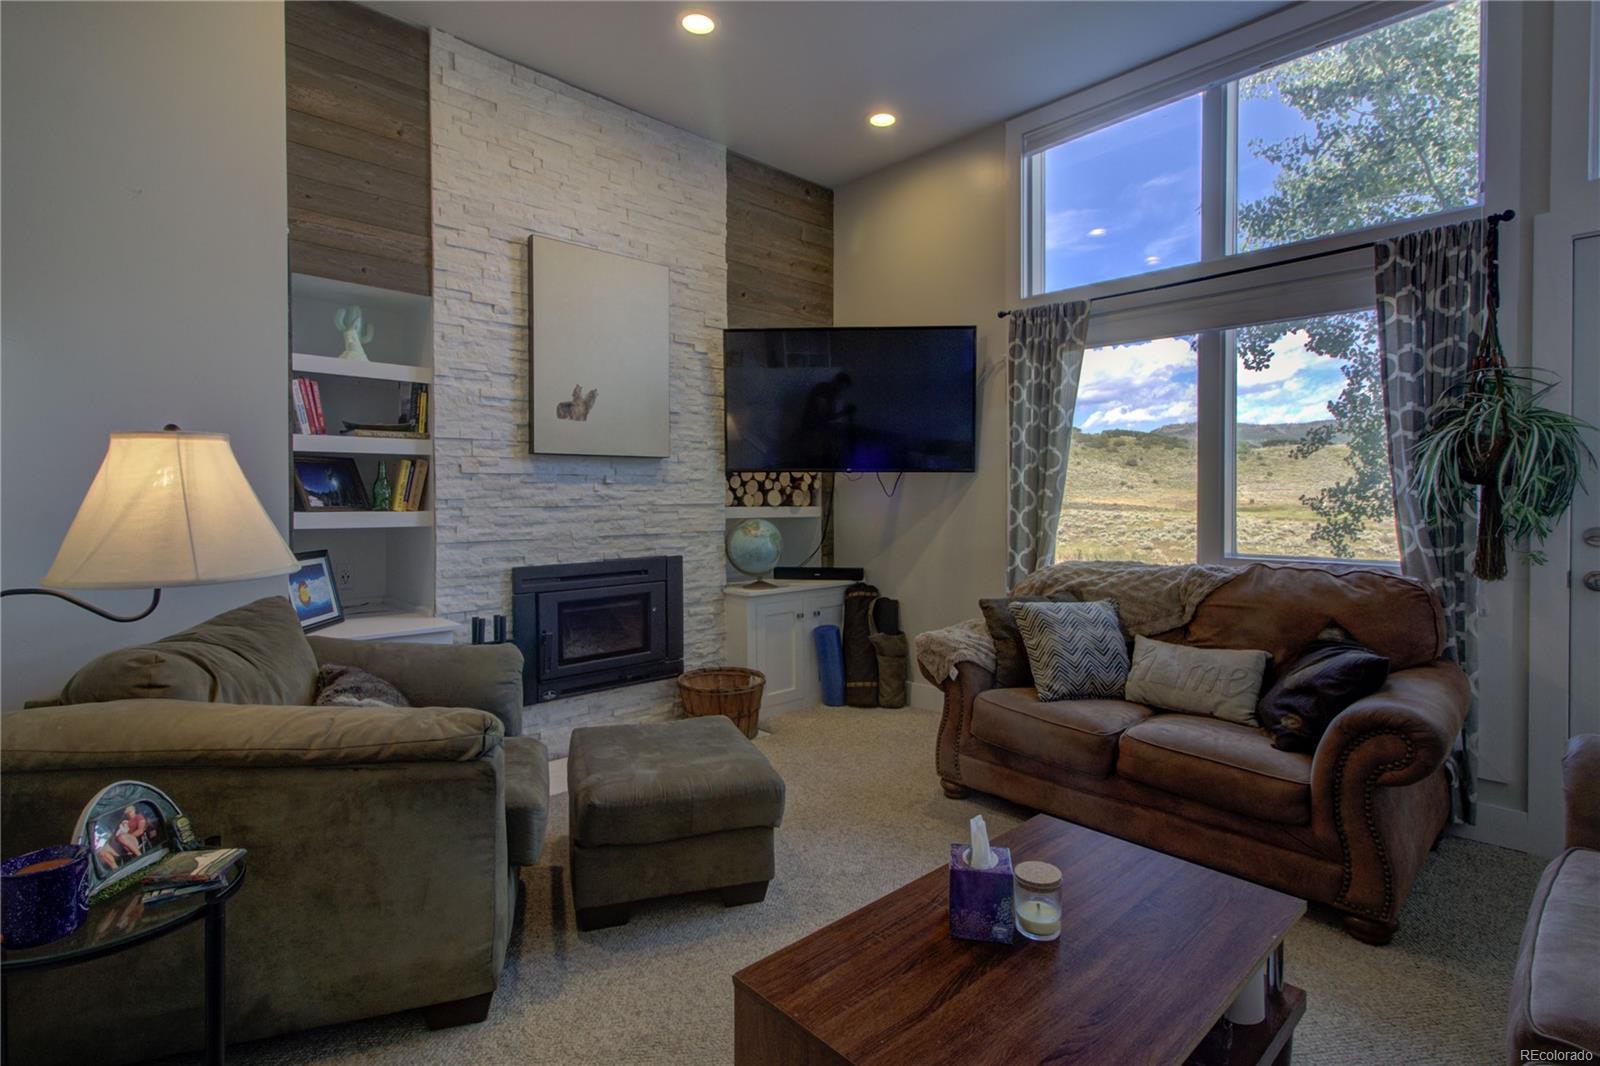 30341 Sagebrush Trail #407, Oak Creek, CO 80467 - Oak Creek, CO real estate listing